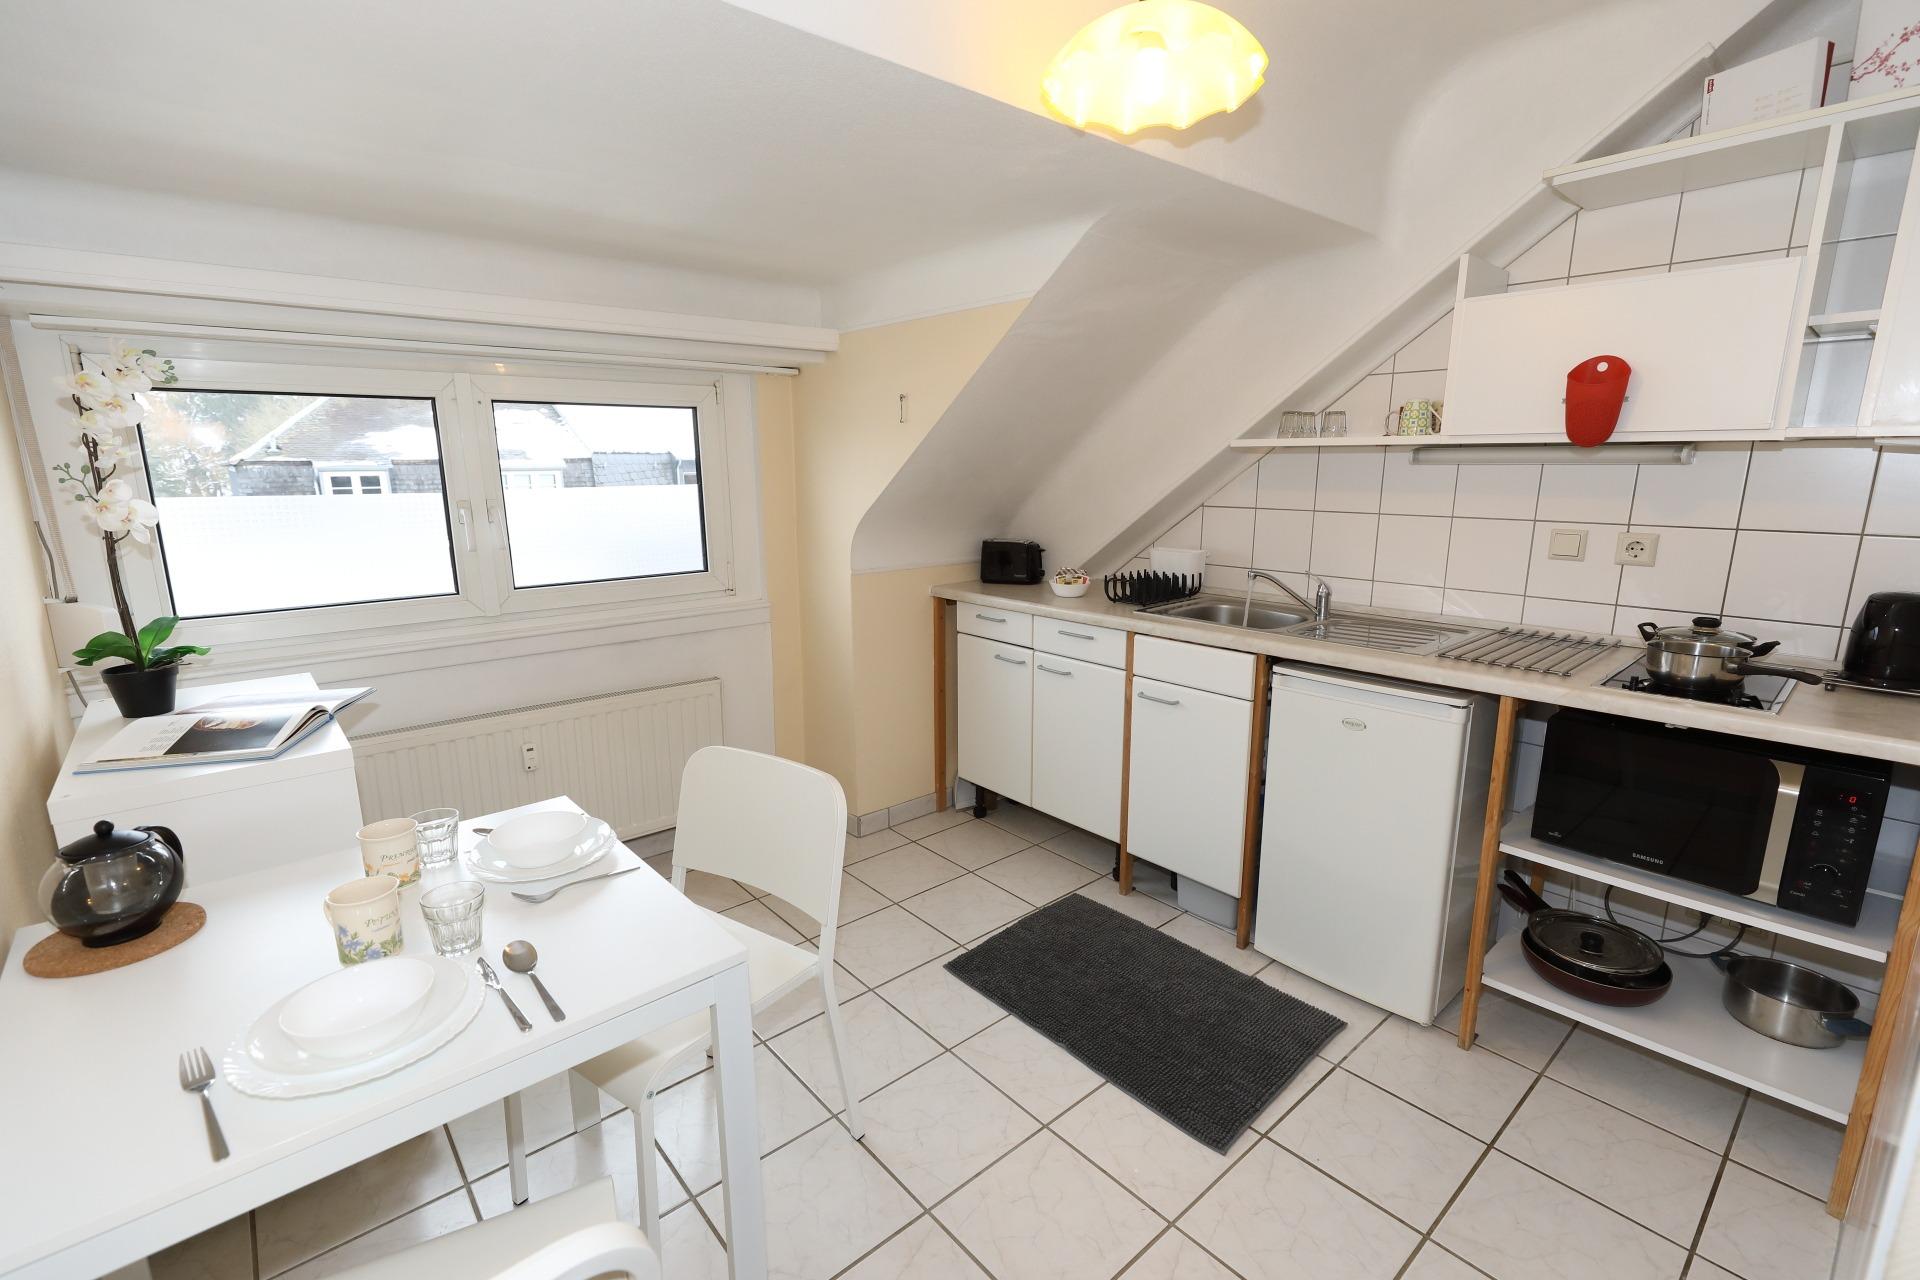 1 bedroom apartment in Cessange